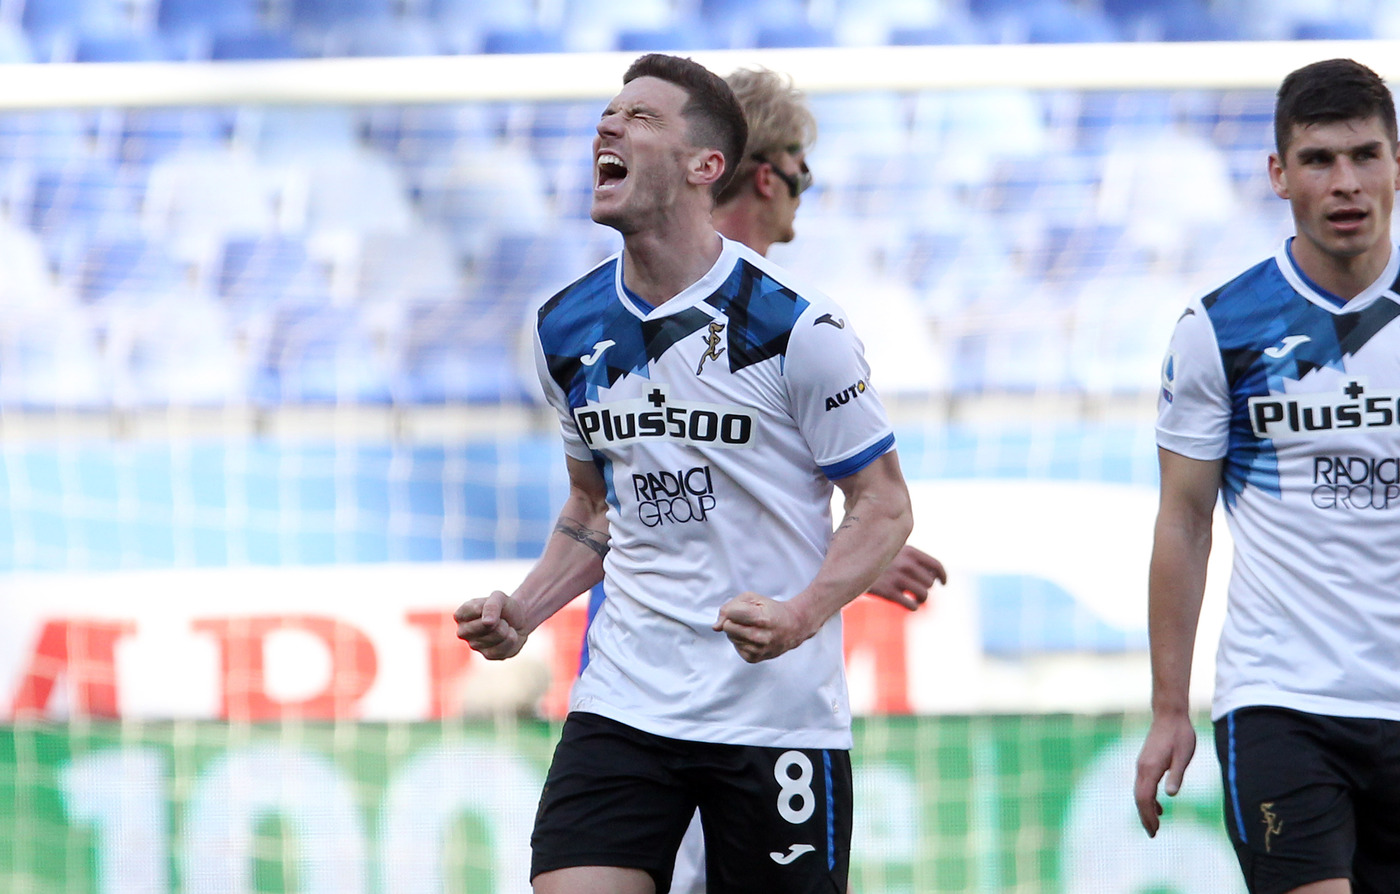 Serie A, Malinovskyi e Gosens stendono la Samp: Atalanta sale al 3° posto